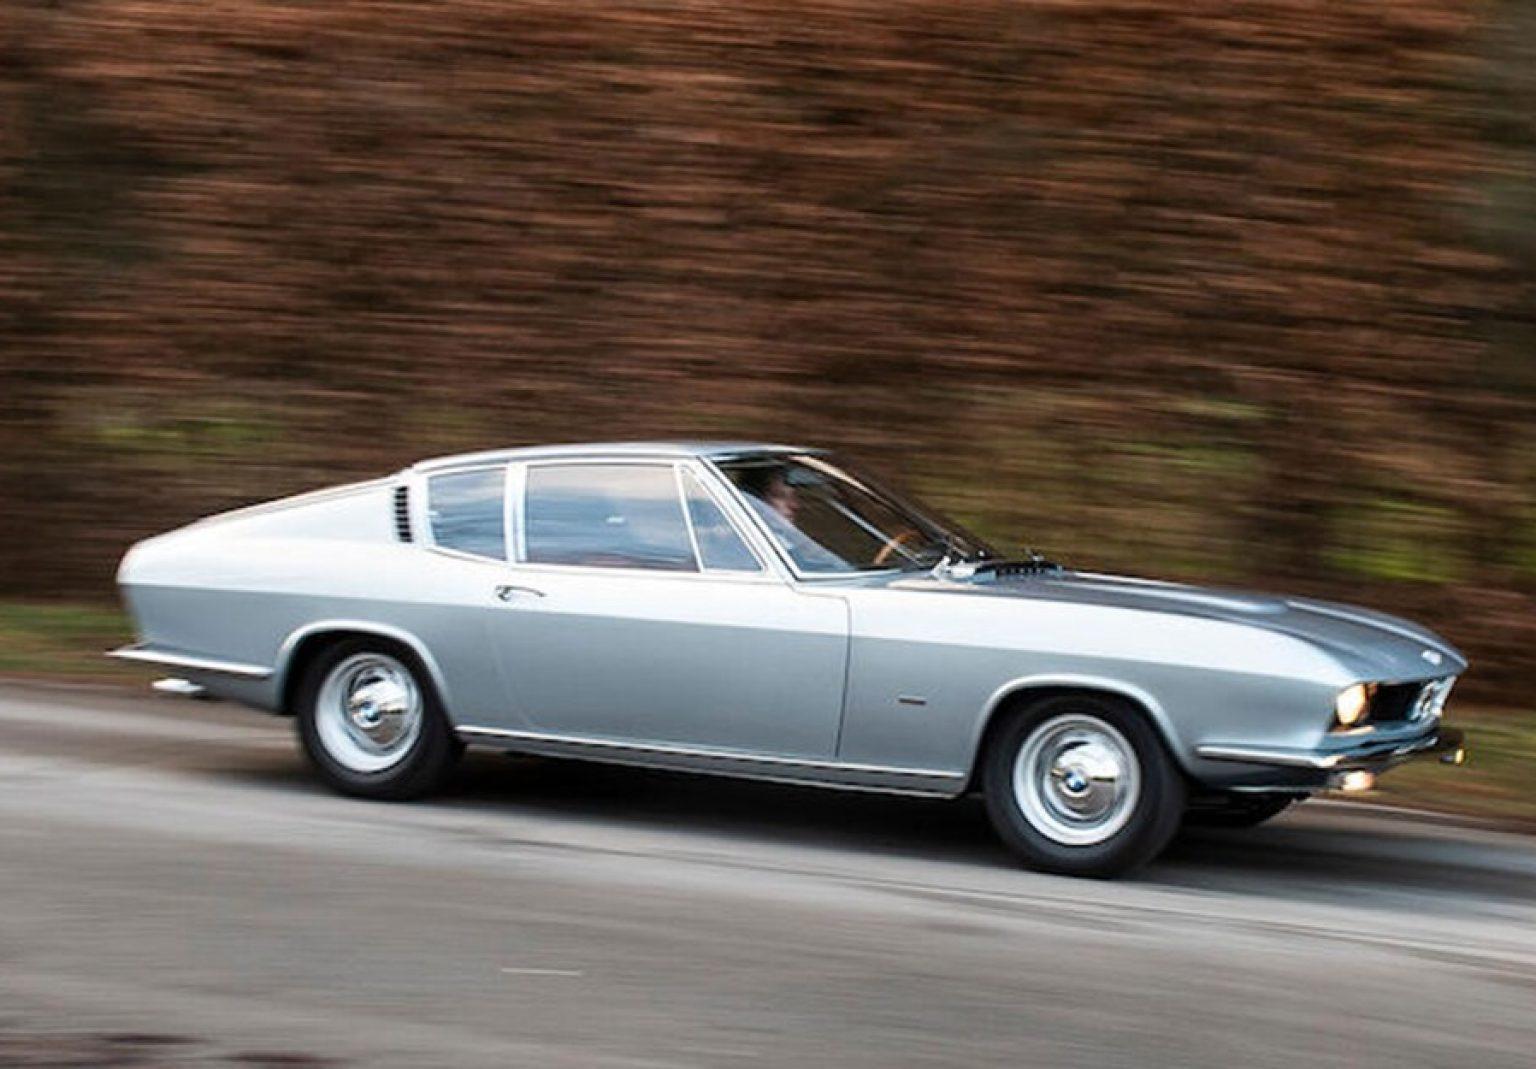 1967-BMW-Glas-3000-V8-Fastback-Coupe-Prototype-Coachwork-31